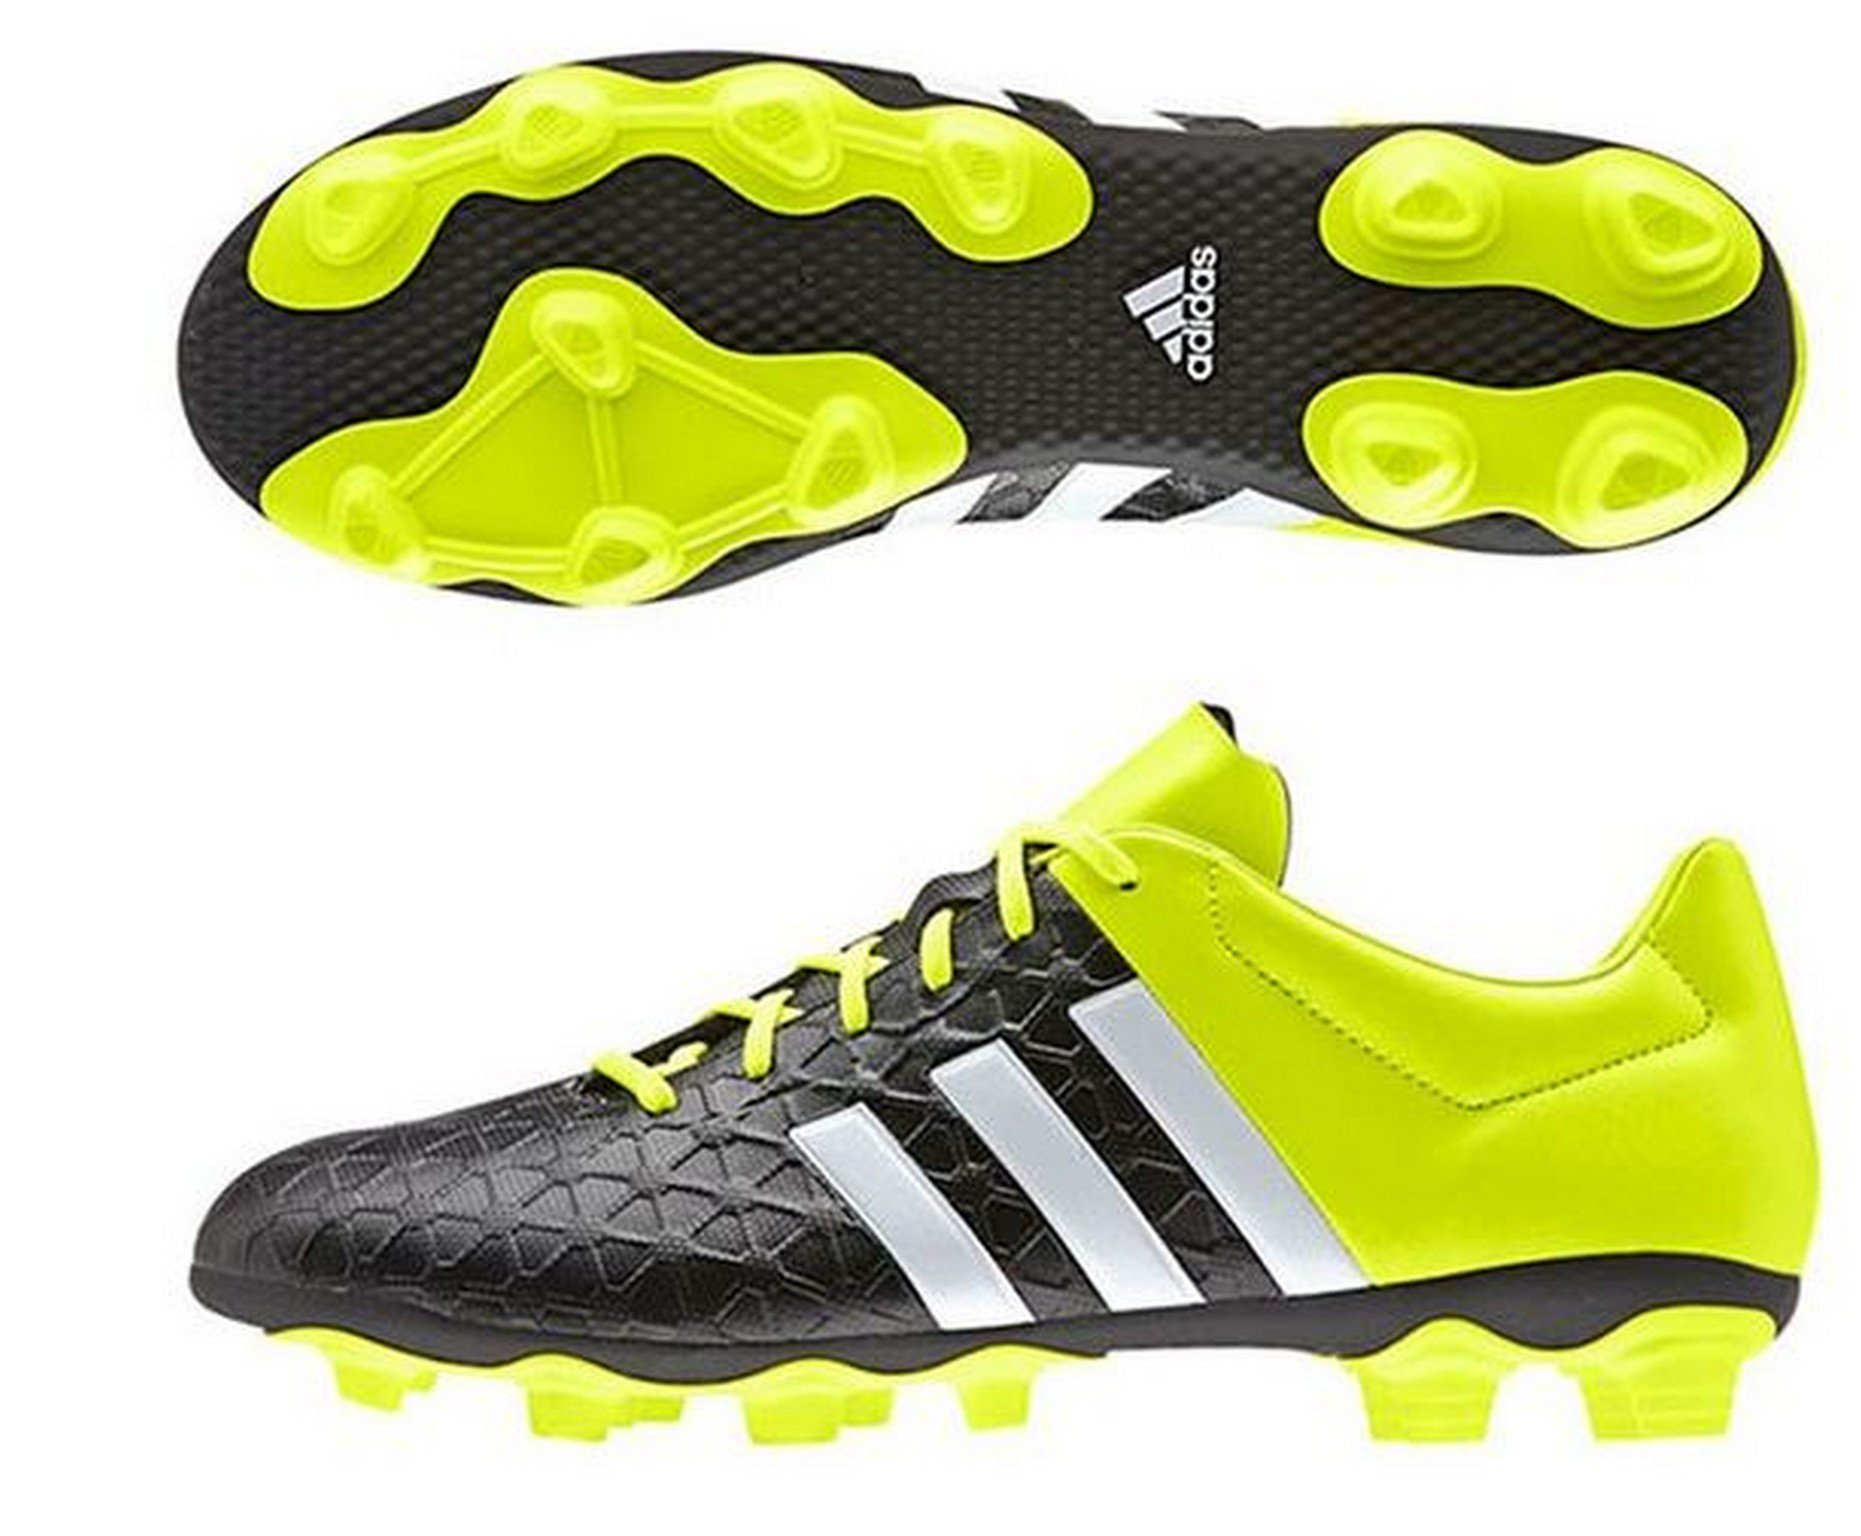 Adidas FxgChaussures Black solar Yellow40 De 2 Ace 3 ftwr White HommeJauneGelbcore 15 Football 4 0OnkwP